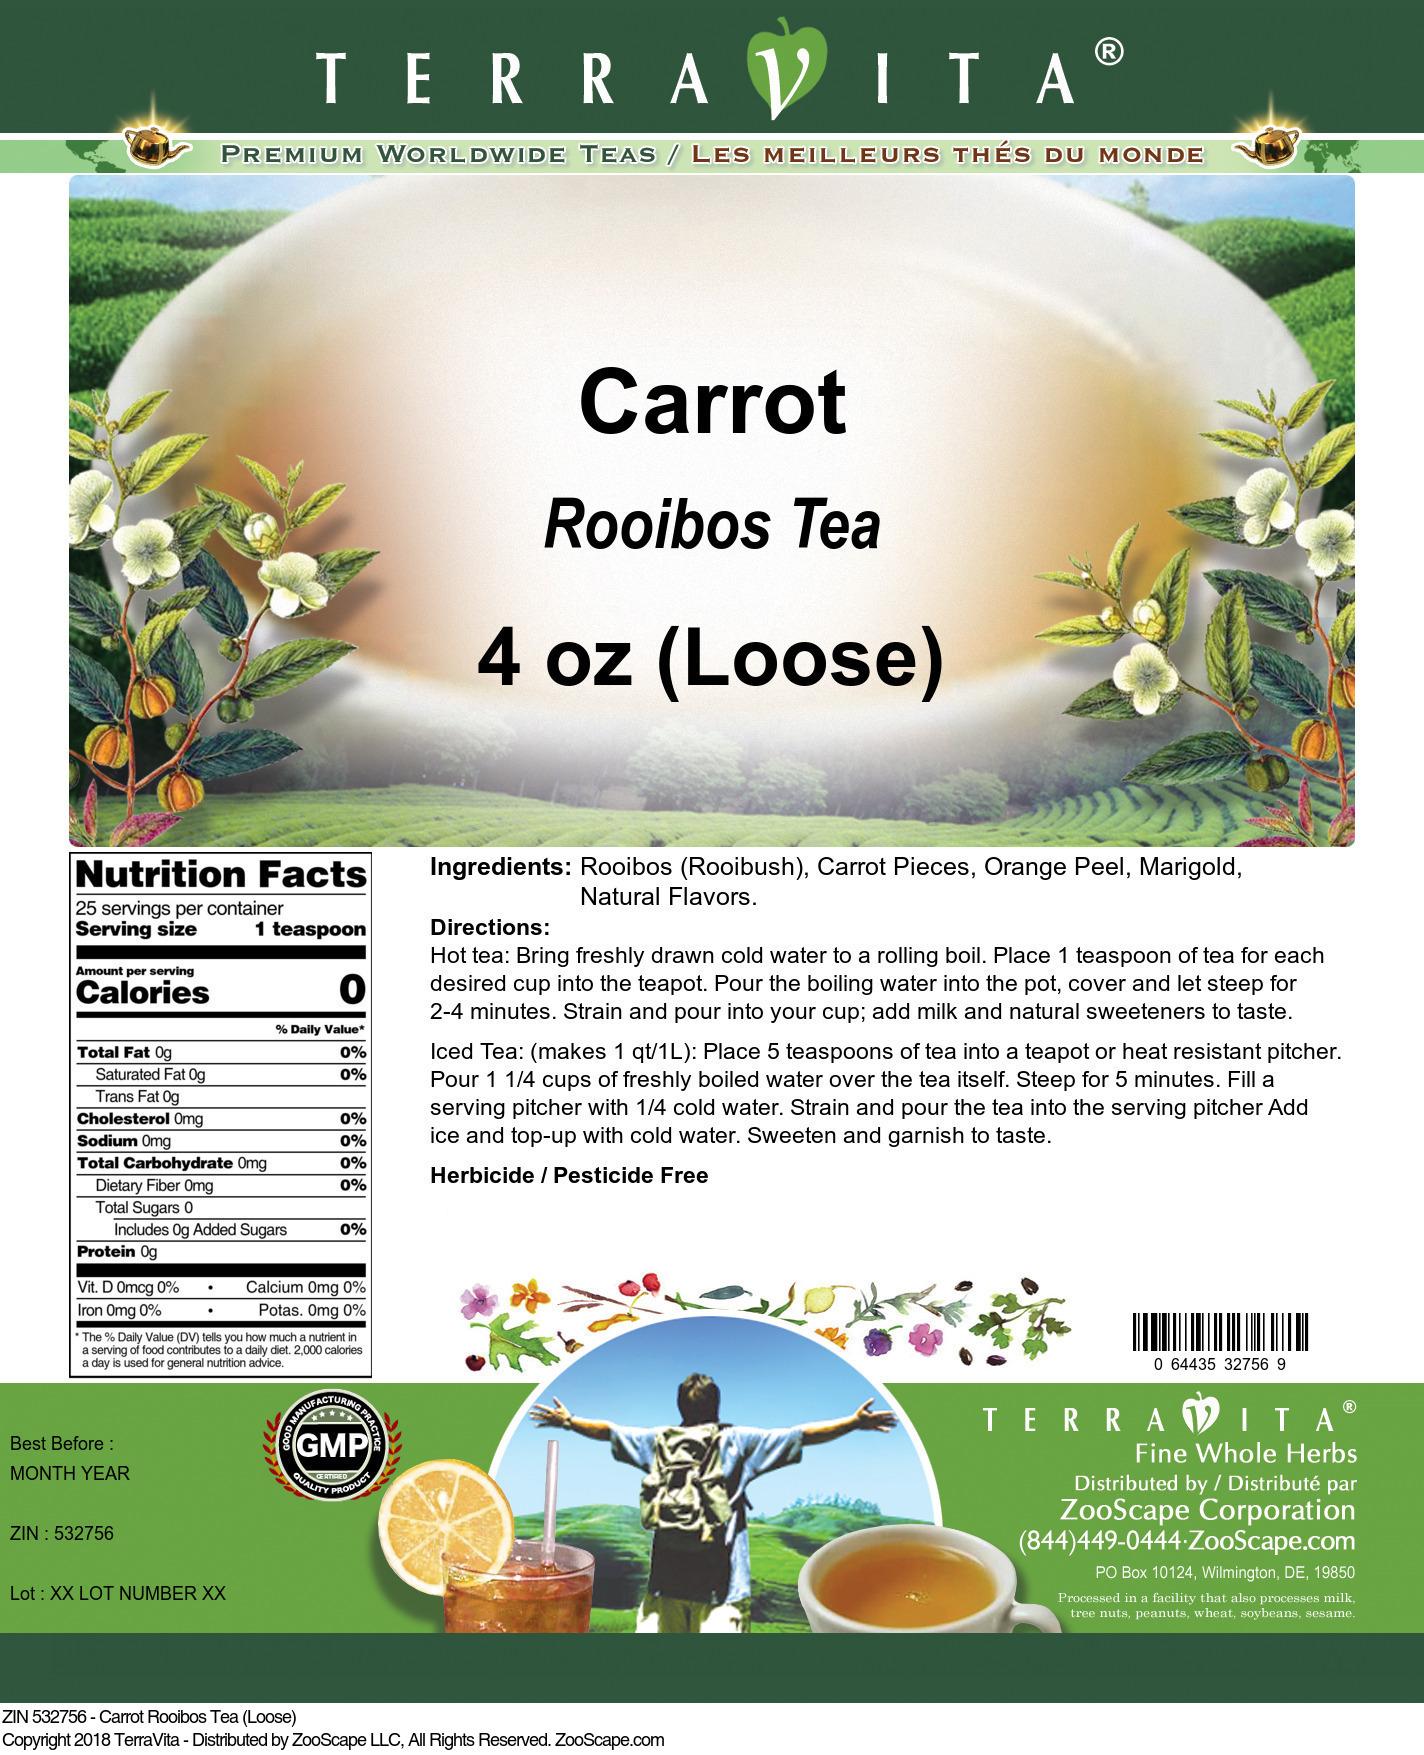 Carrot Rooibos Tea (Loose)